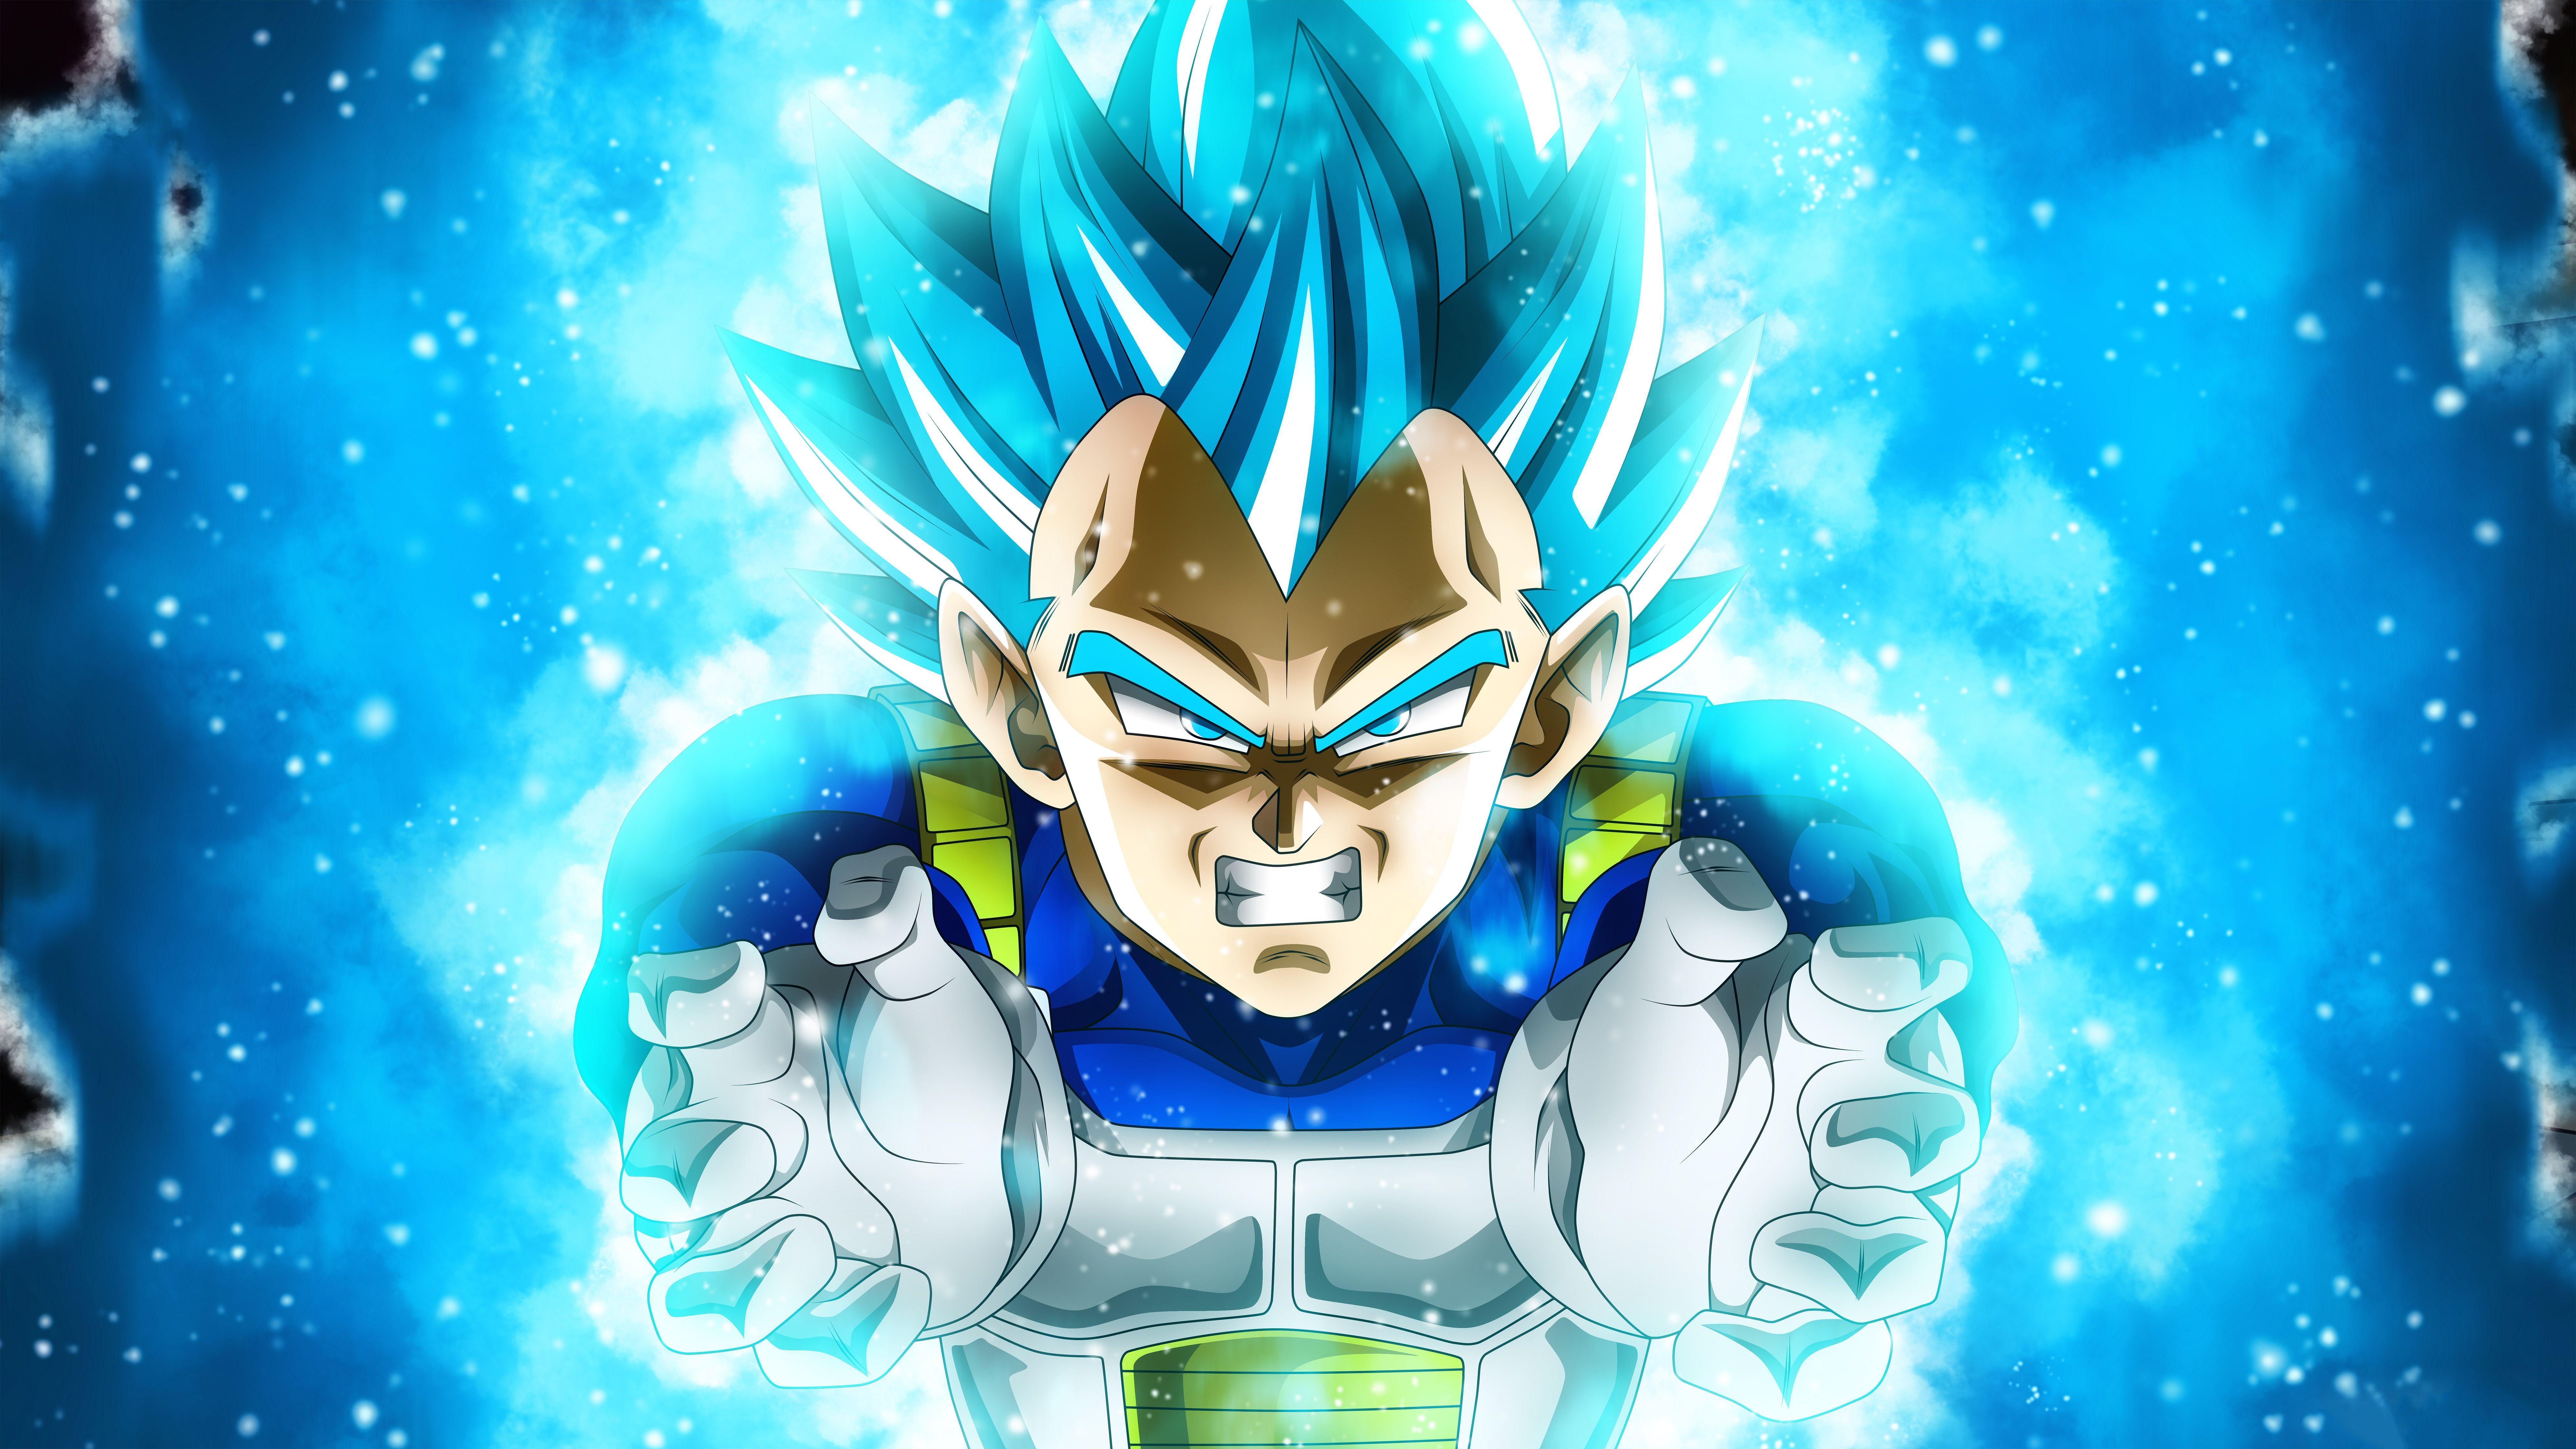 Ultra Hd Anime Ps4 Wallpaper